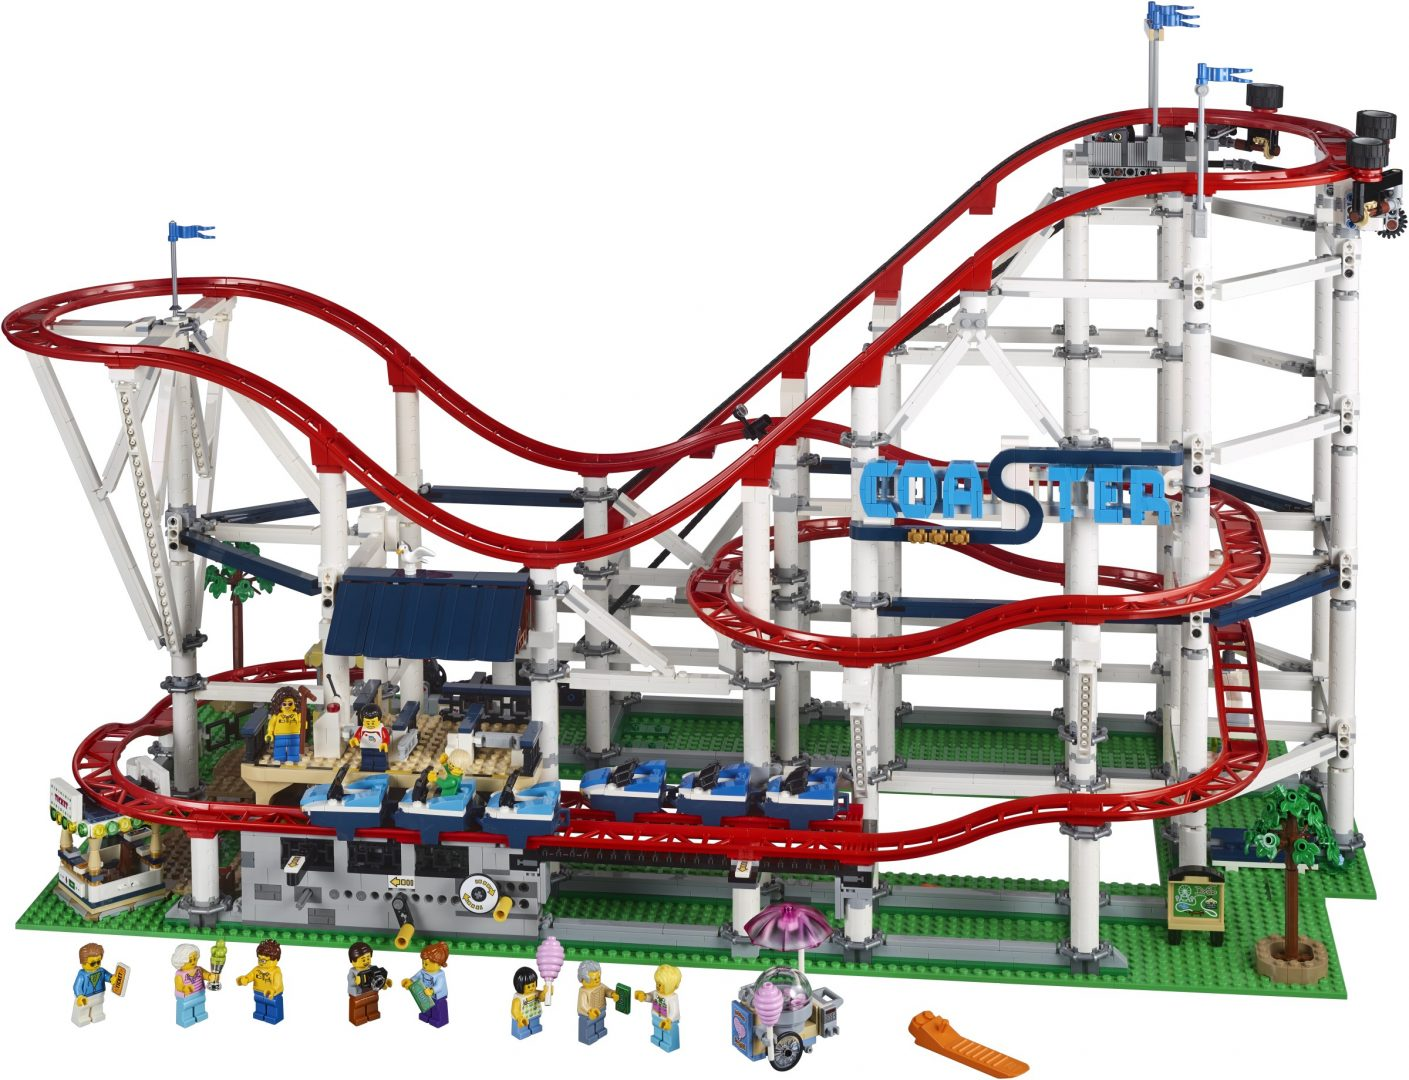 Lego Creator 10261 Vuoristorata